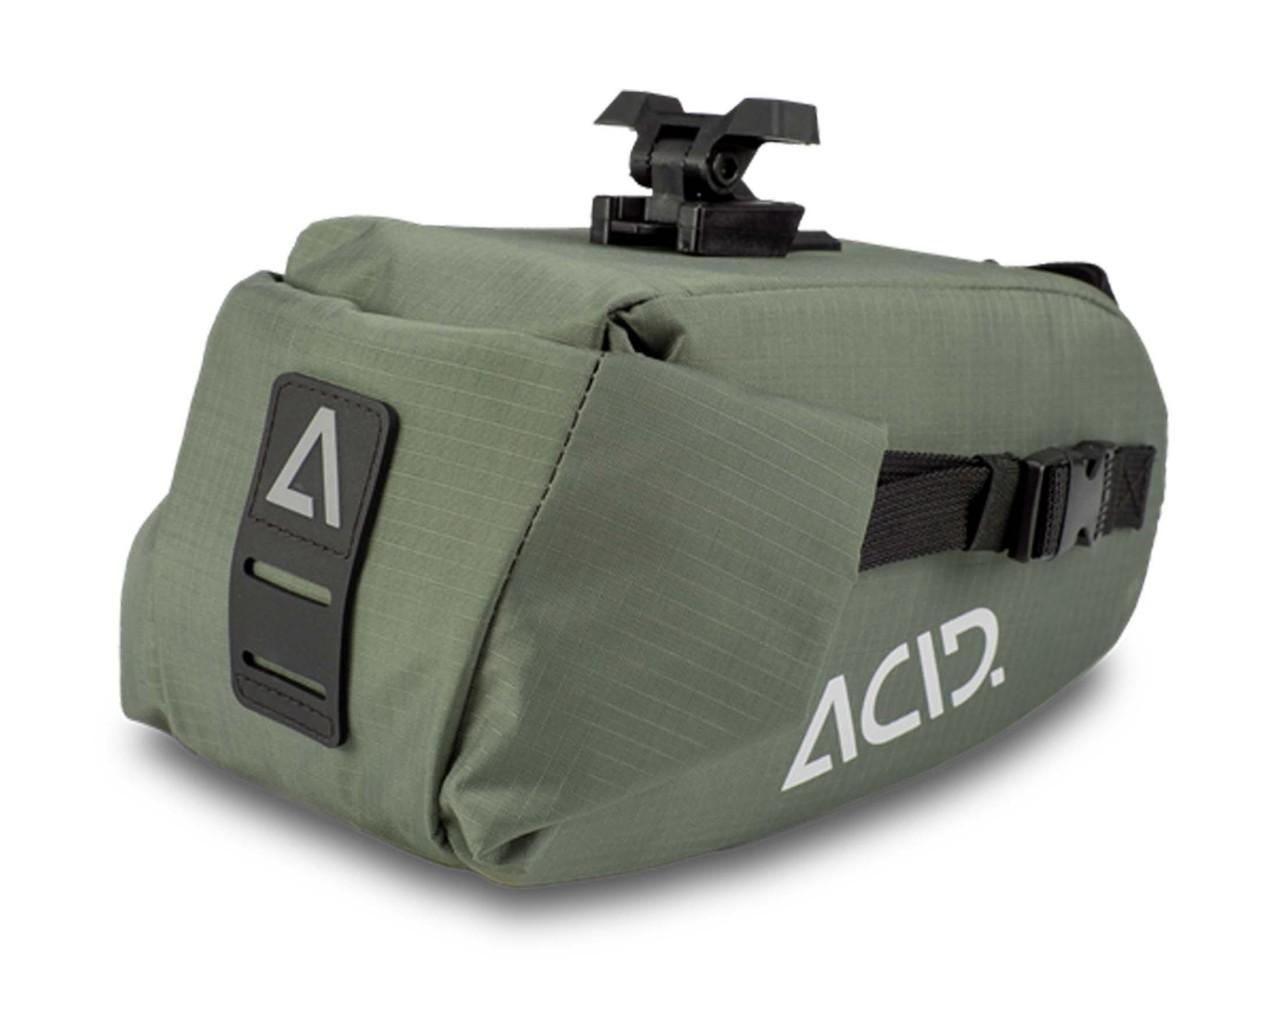 Cube ACID Satteltasche Click XL   olive